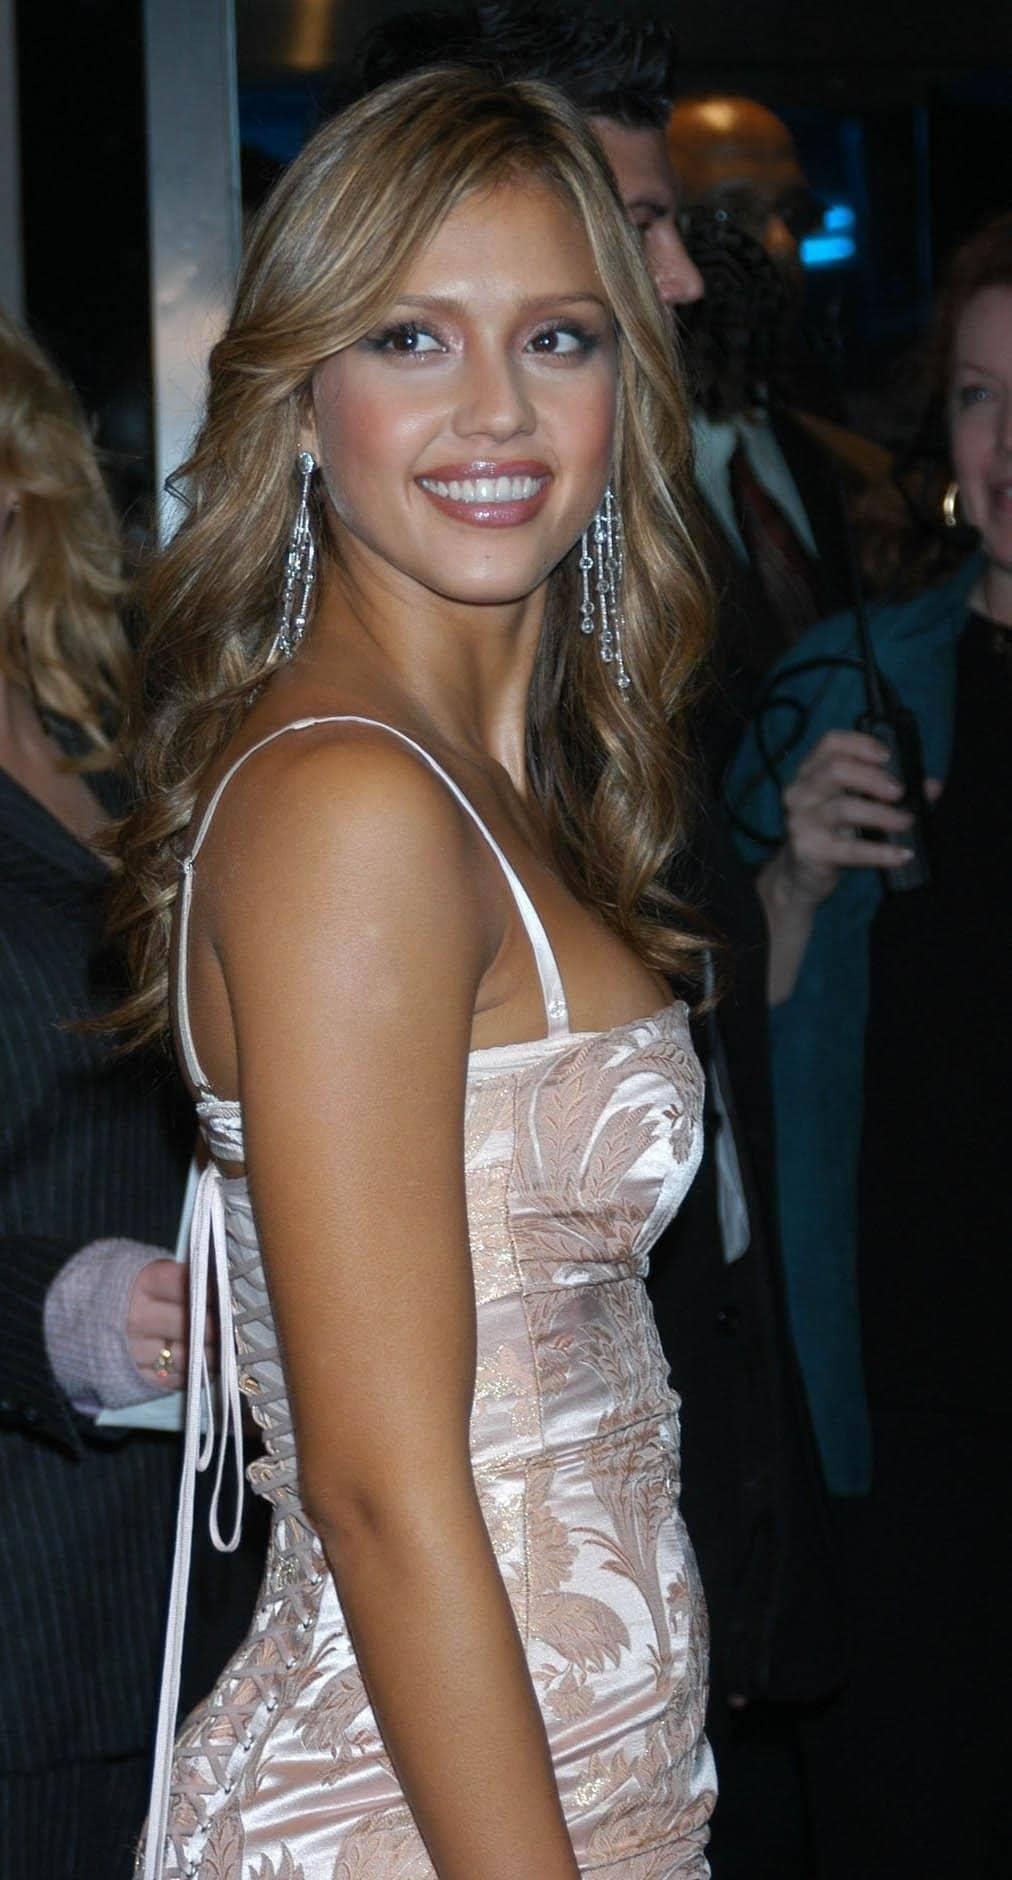 Jessica Alba at the premiere of Honey